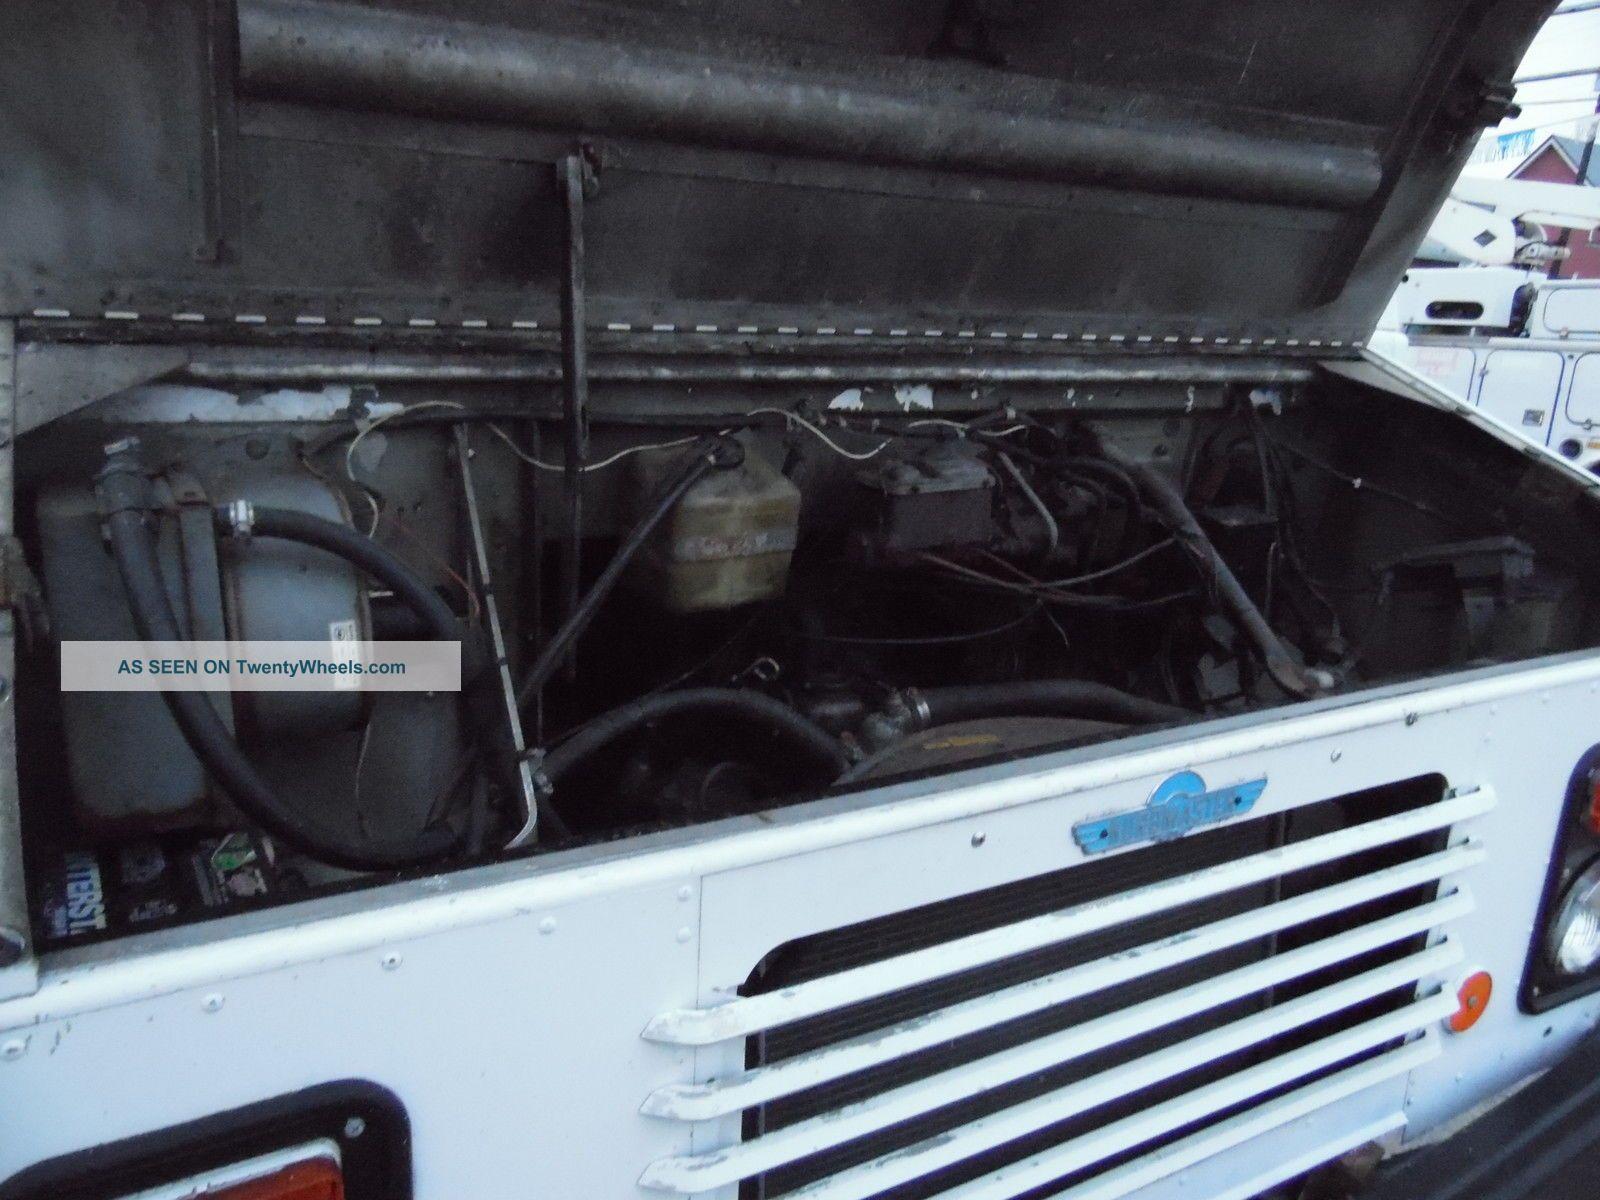 1986 Chevrolet P - 30 Step Panel Van Kurbmaster Deilvery Truck